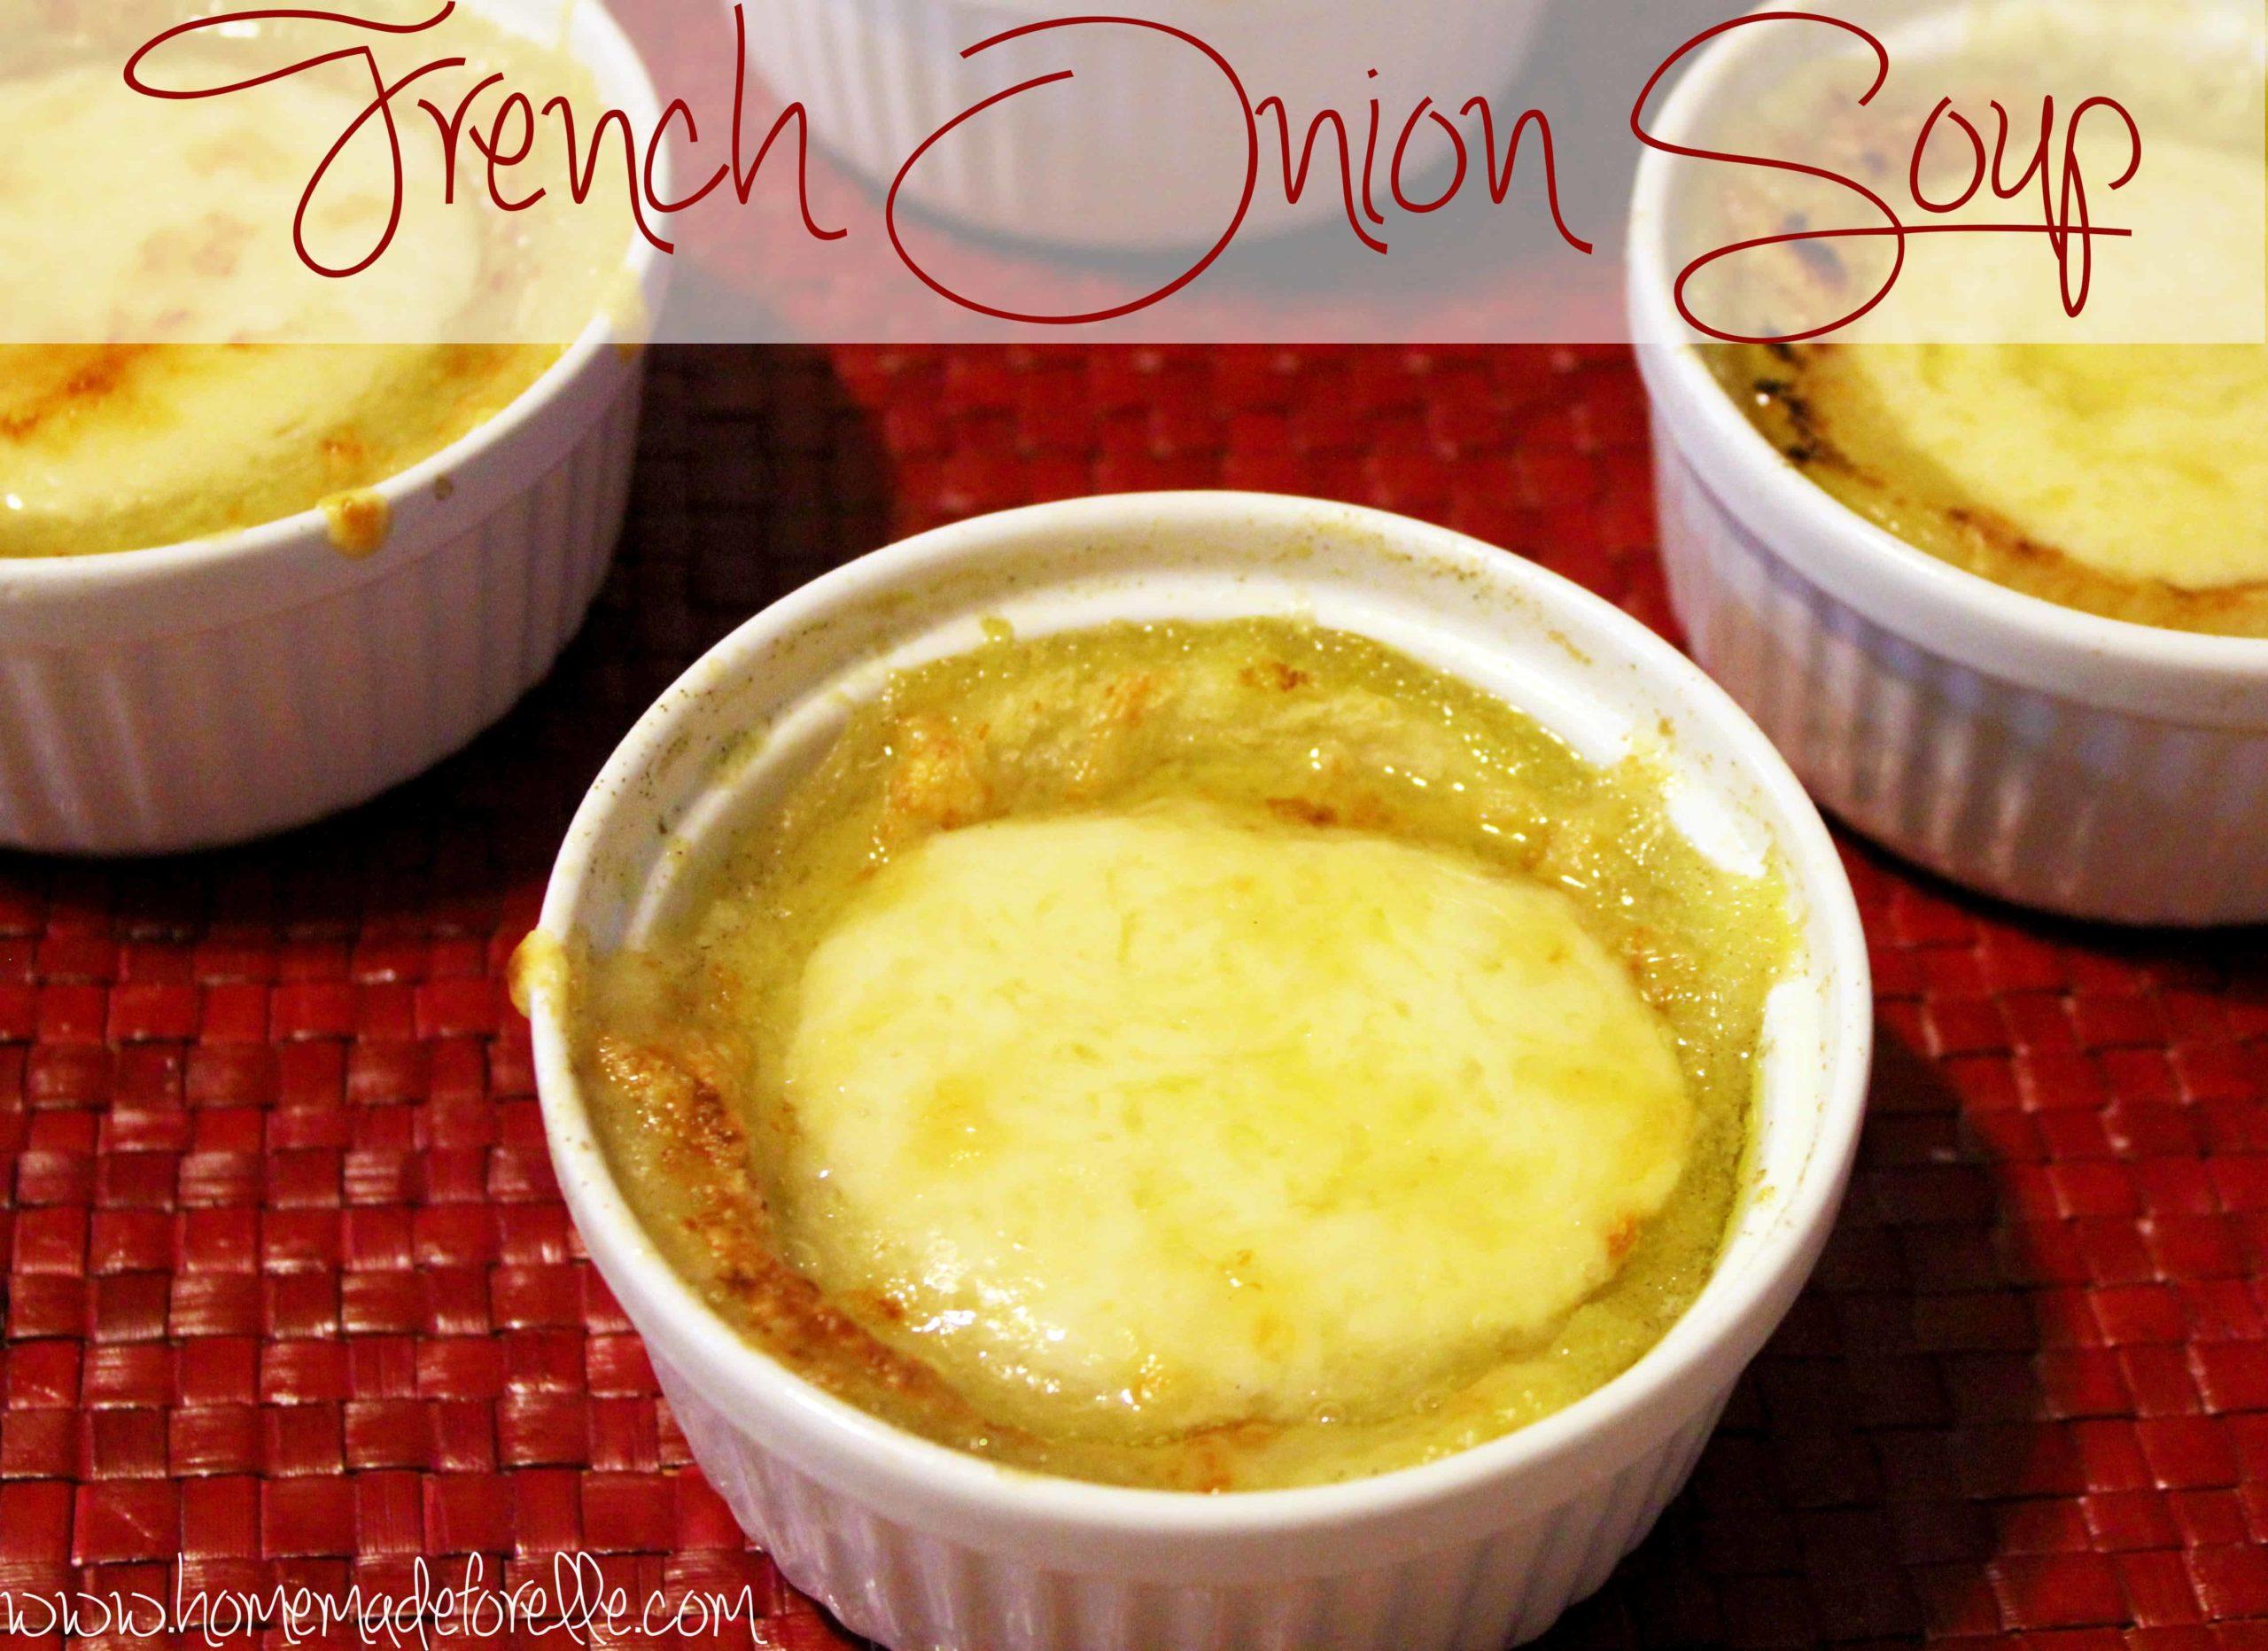 Crockpot French Onion Soup